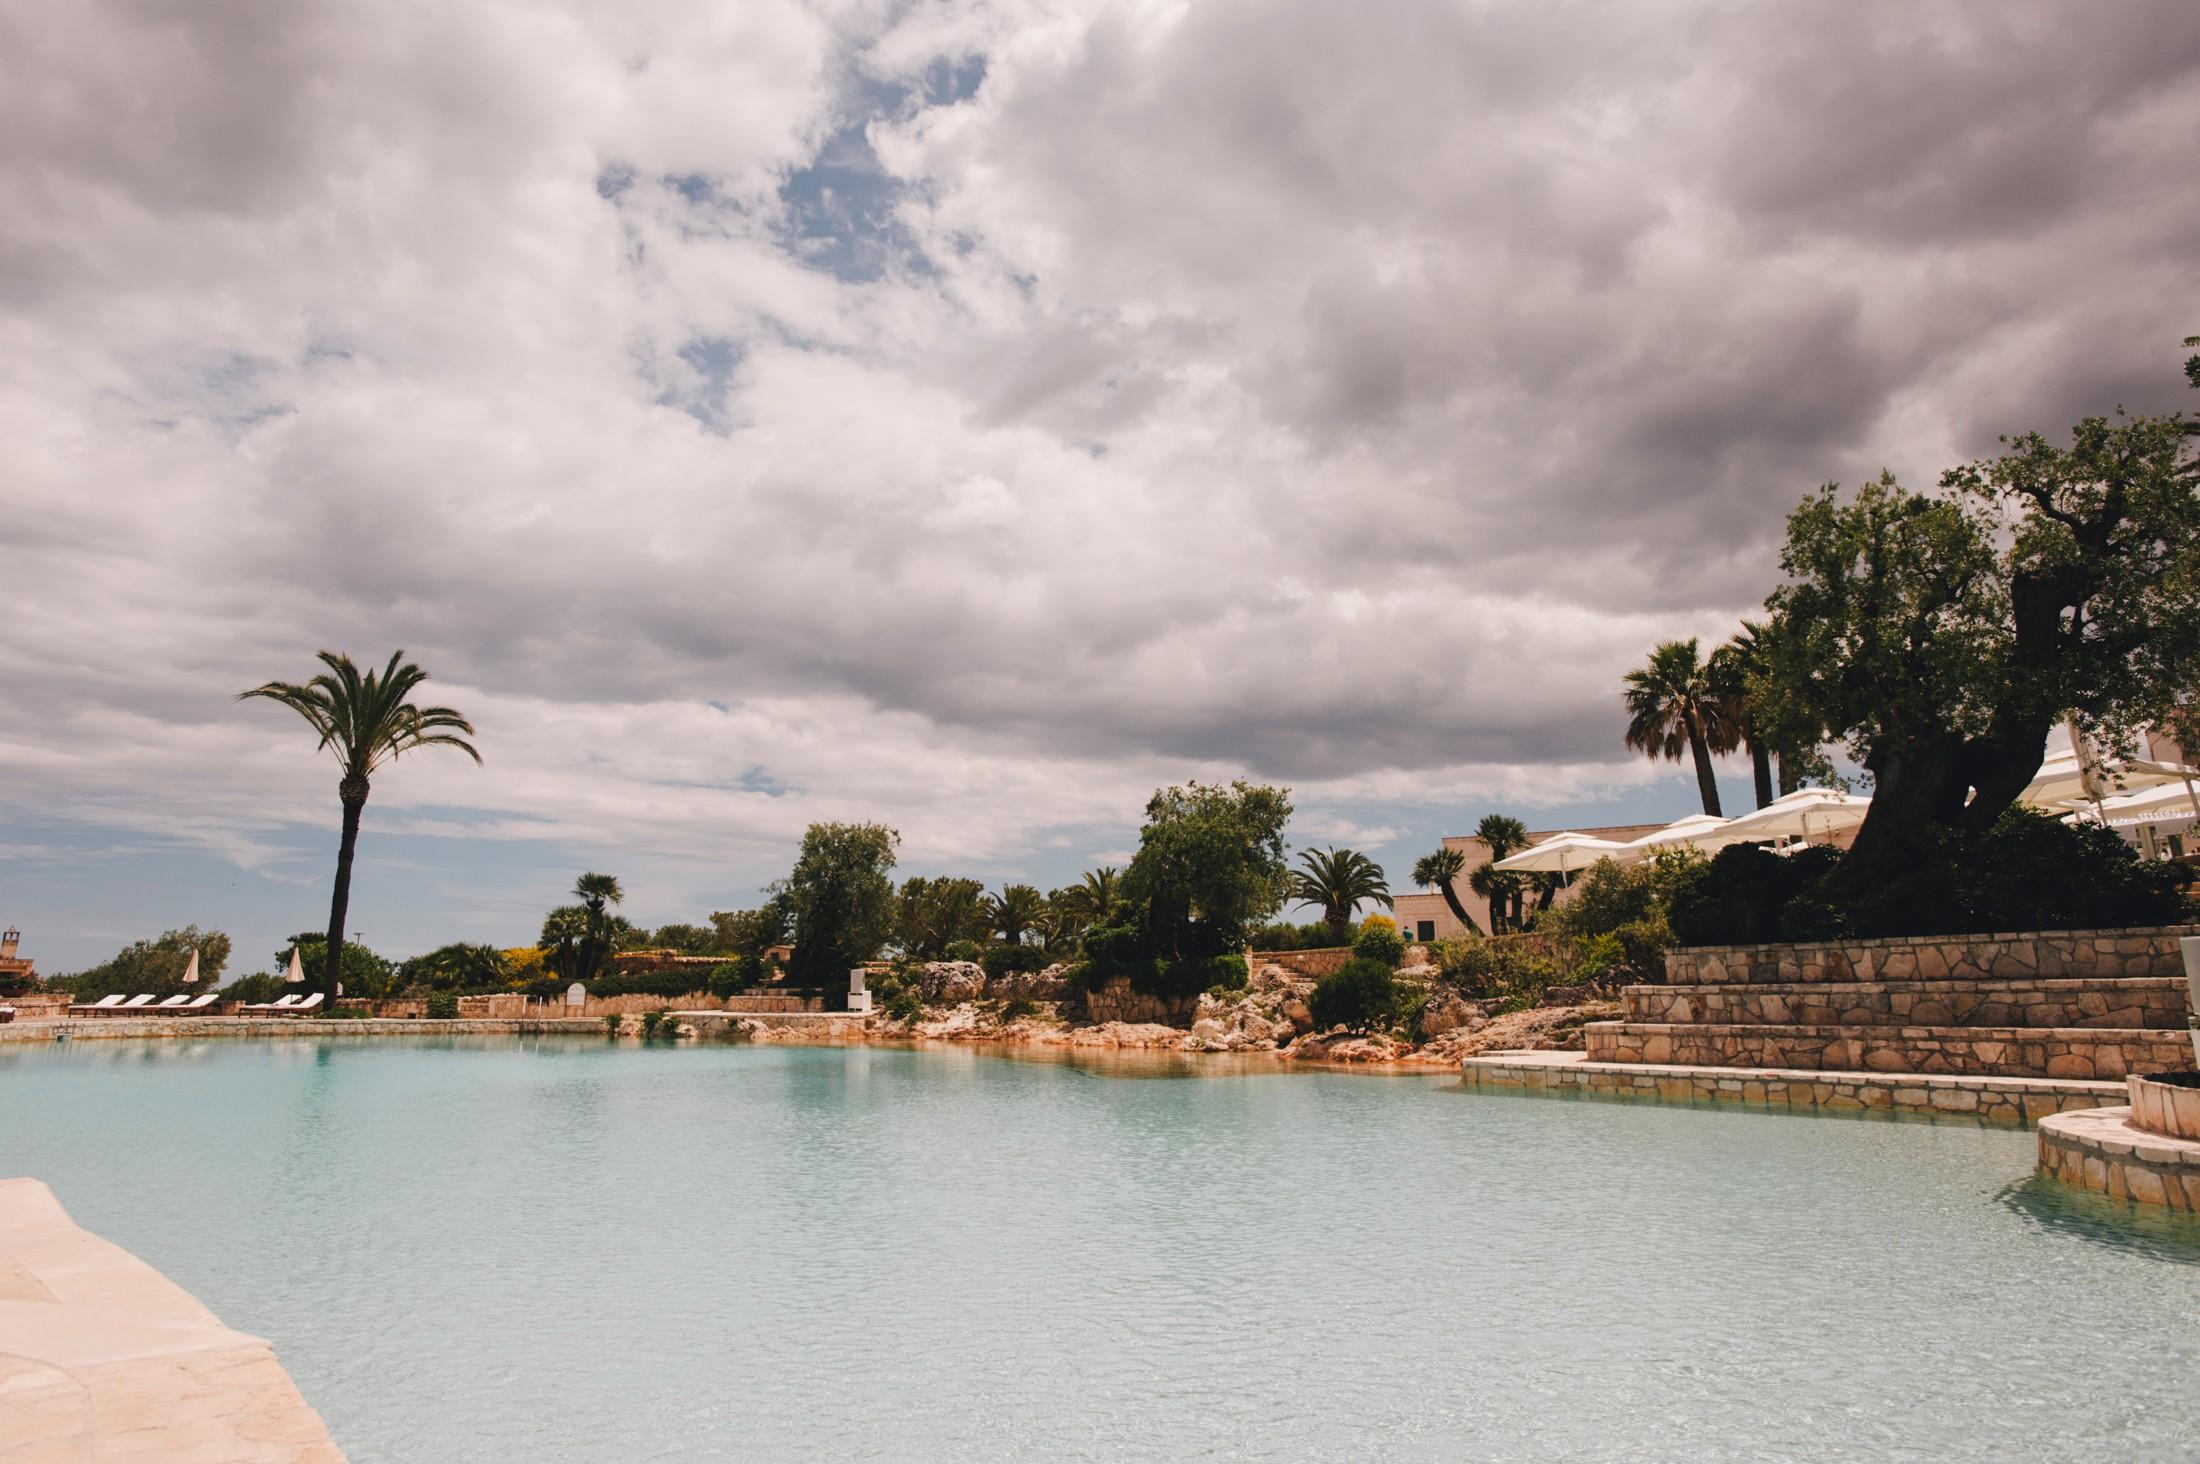 masseria san domenico pool